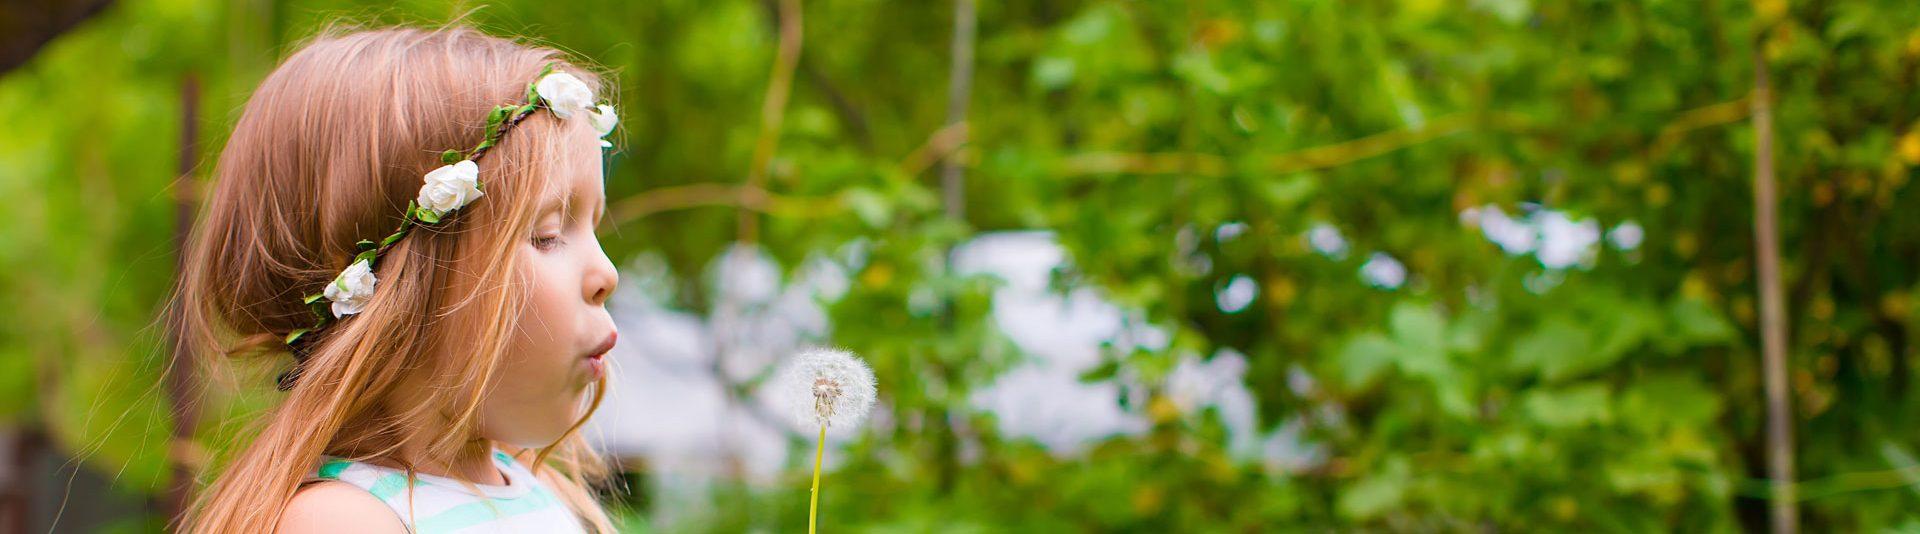 girl dandelion